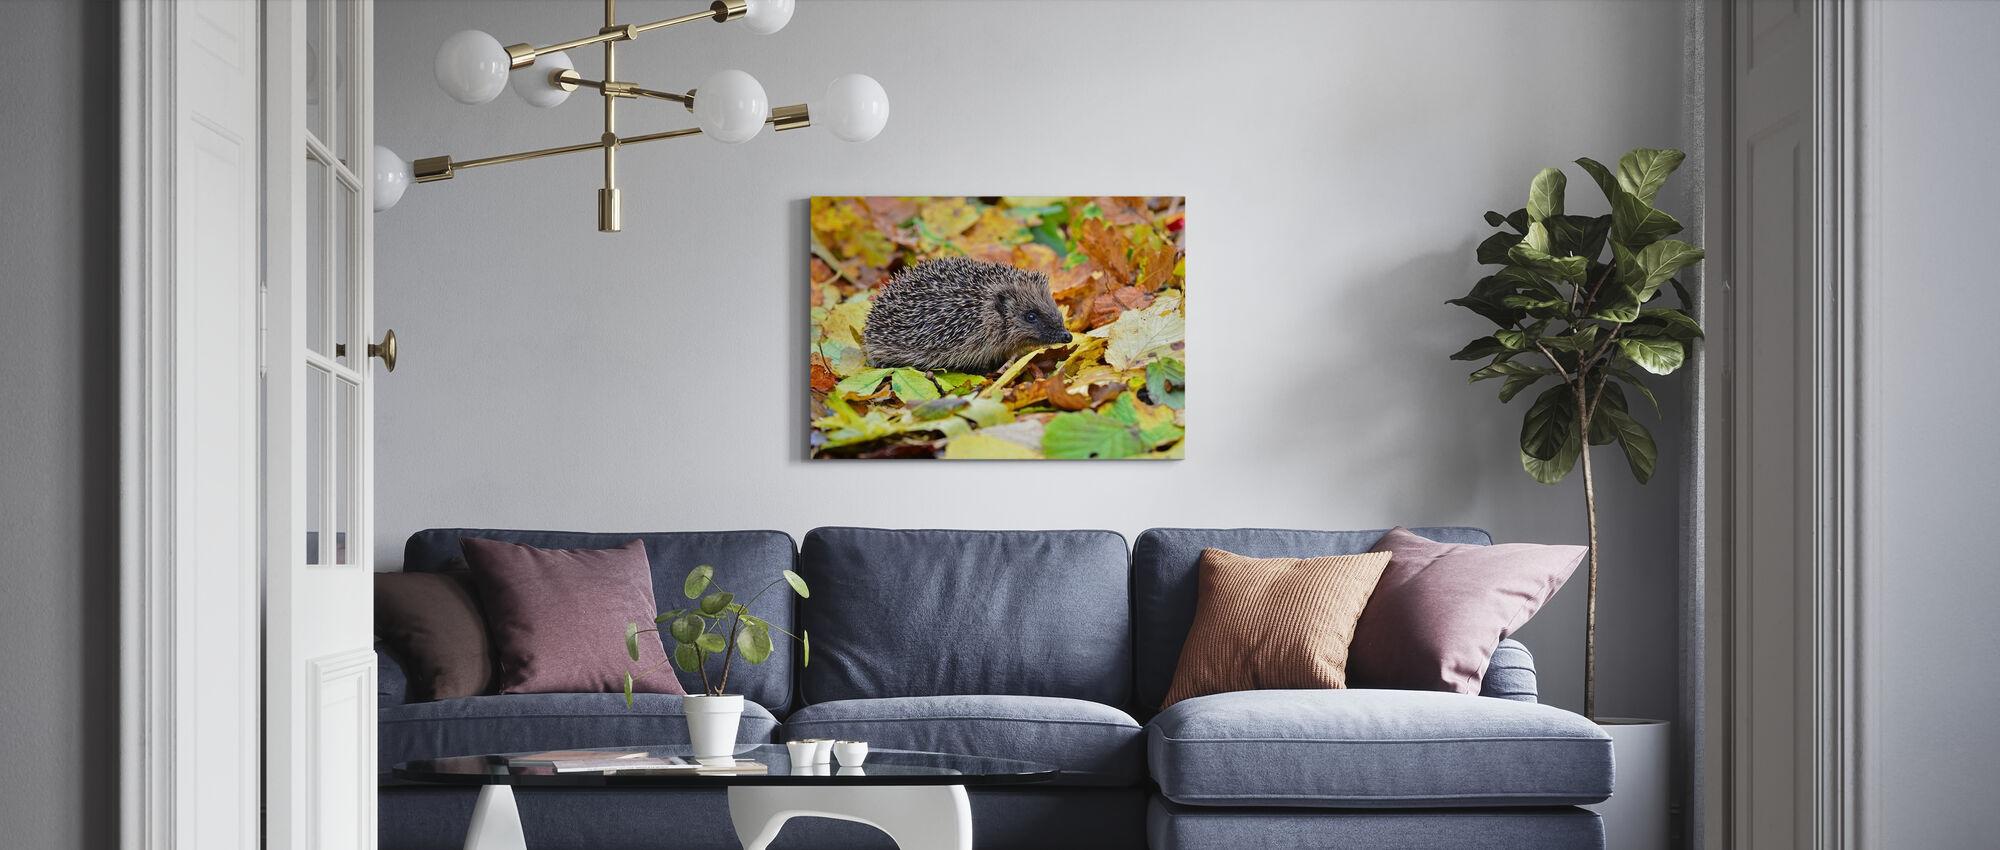 Hedgehog in Autumn Leaves - Canvas print - Living Room